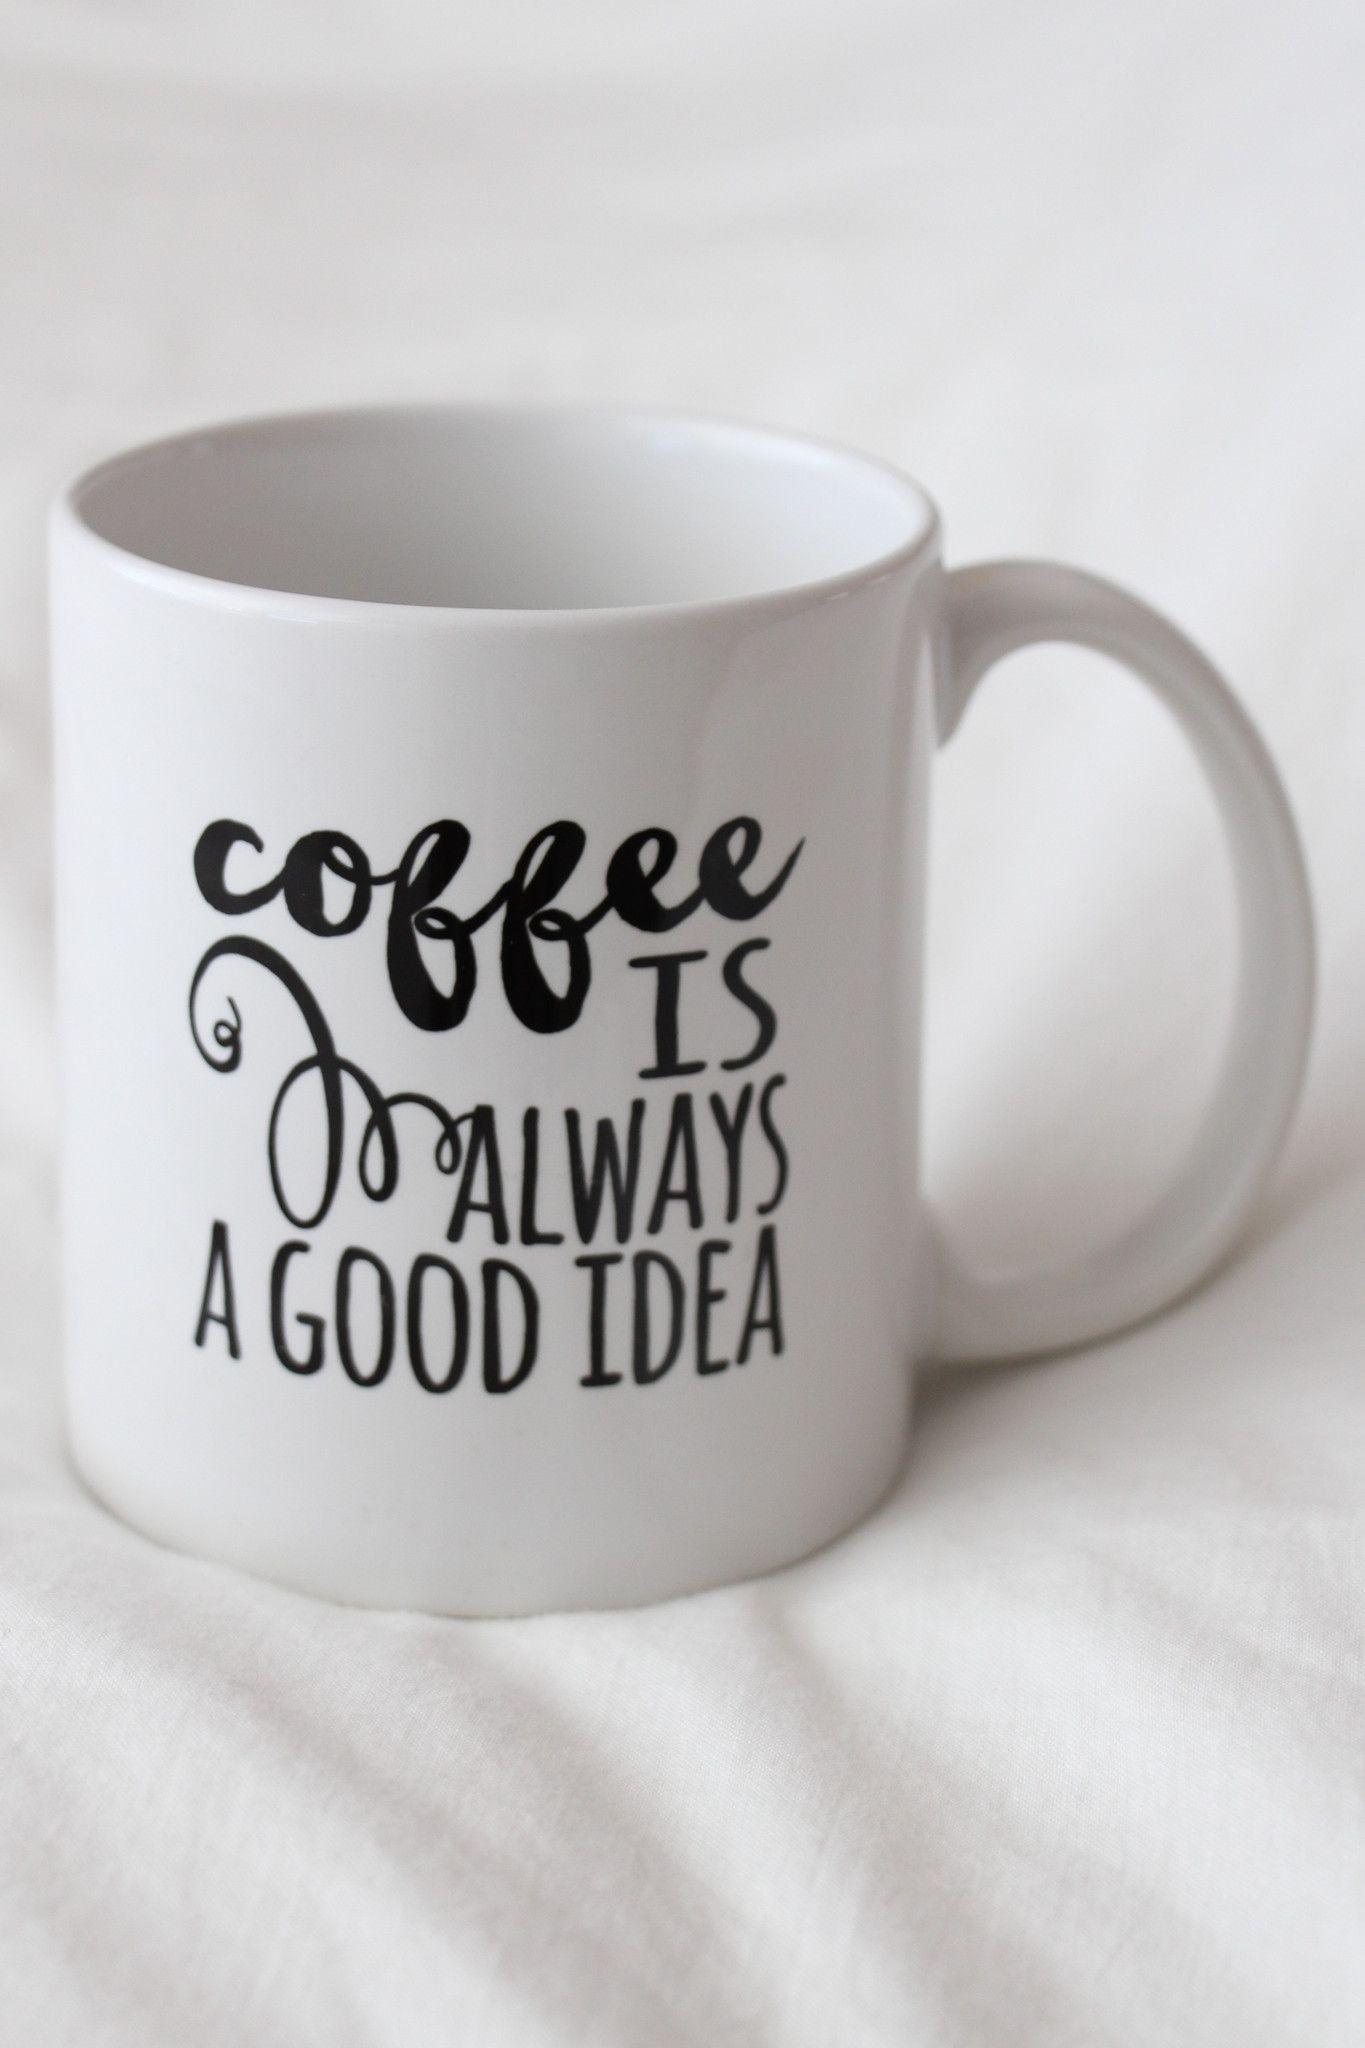 coffee is always a good idea mug shops pinterest tassen bemalen keramik bemalen und kaffee. Black Bedroom Furniture Sets. Home Design Ideas